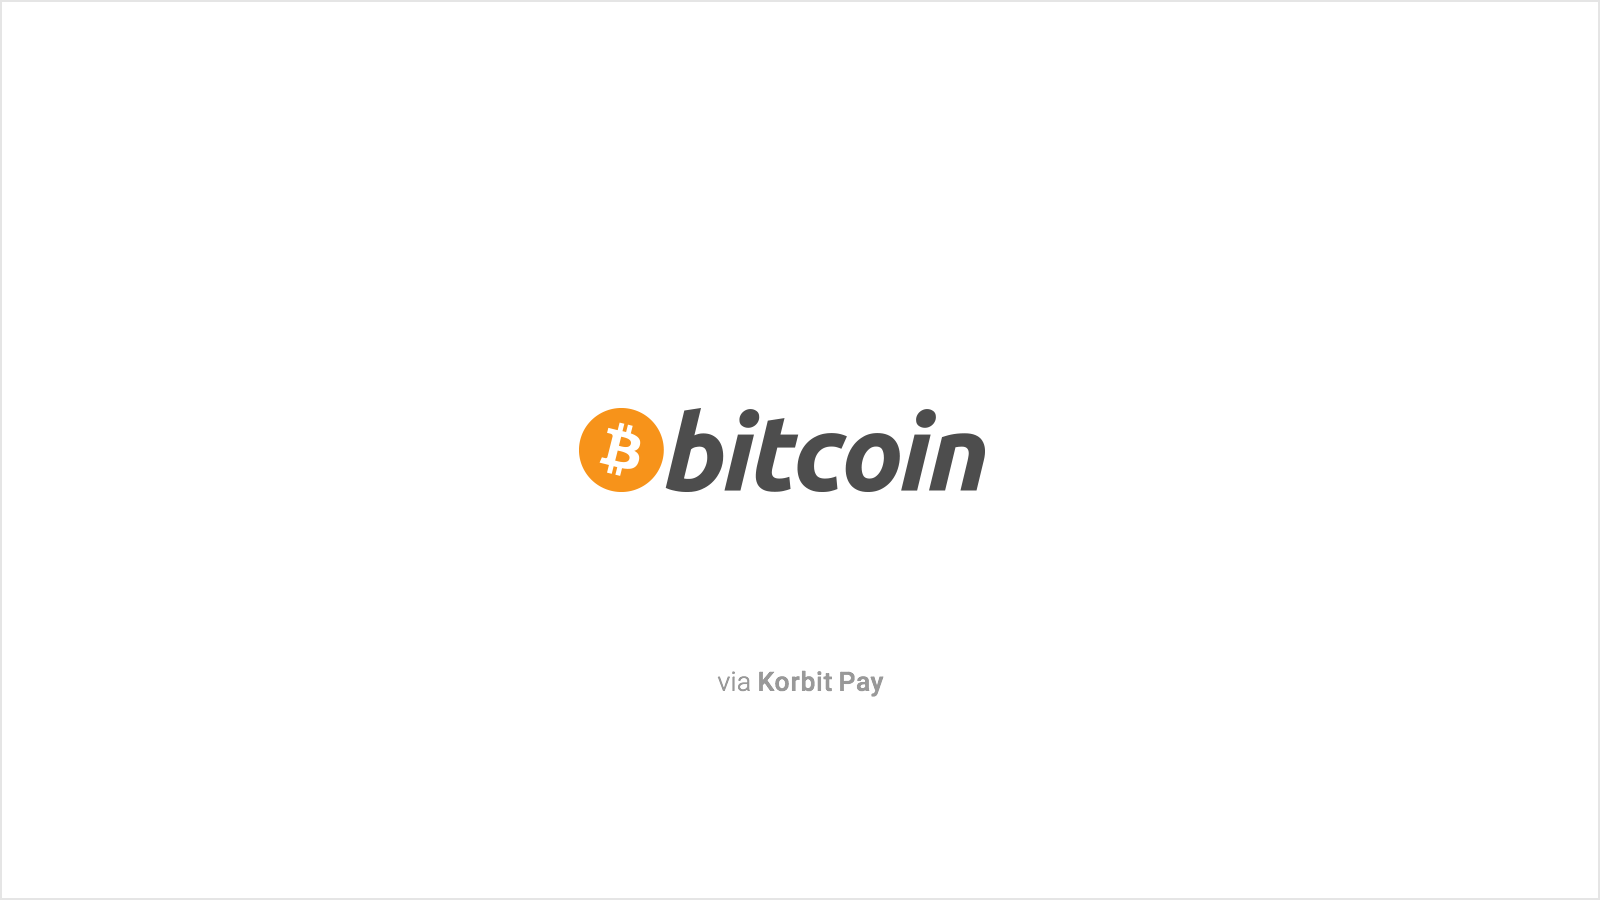 Korbit Pay를 경유한 비트코인